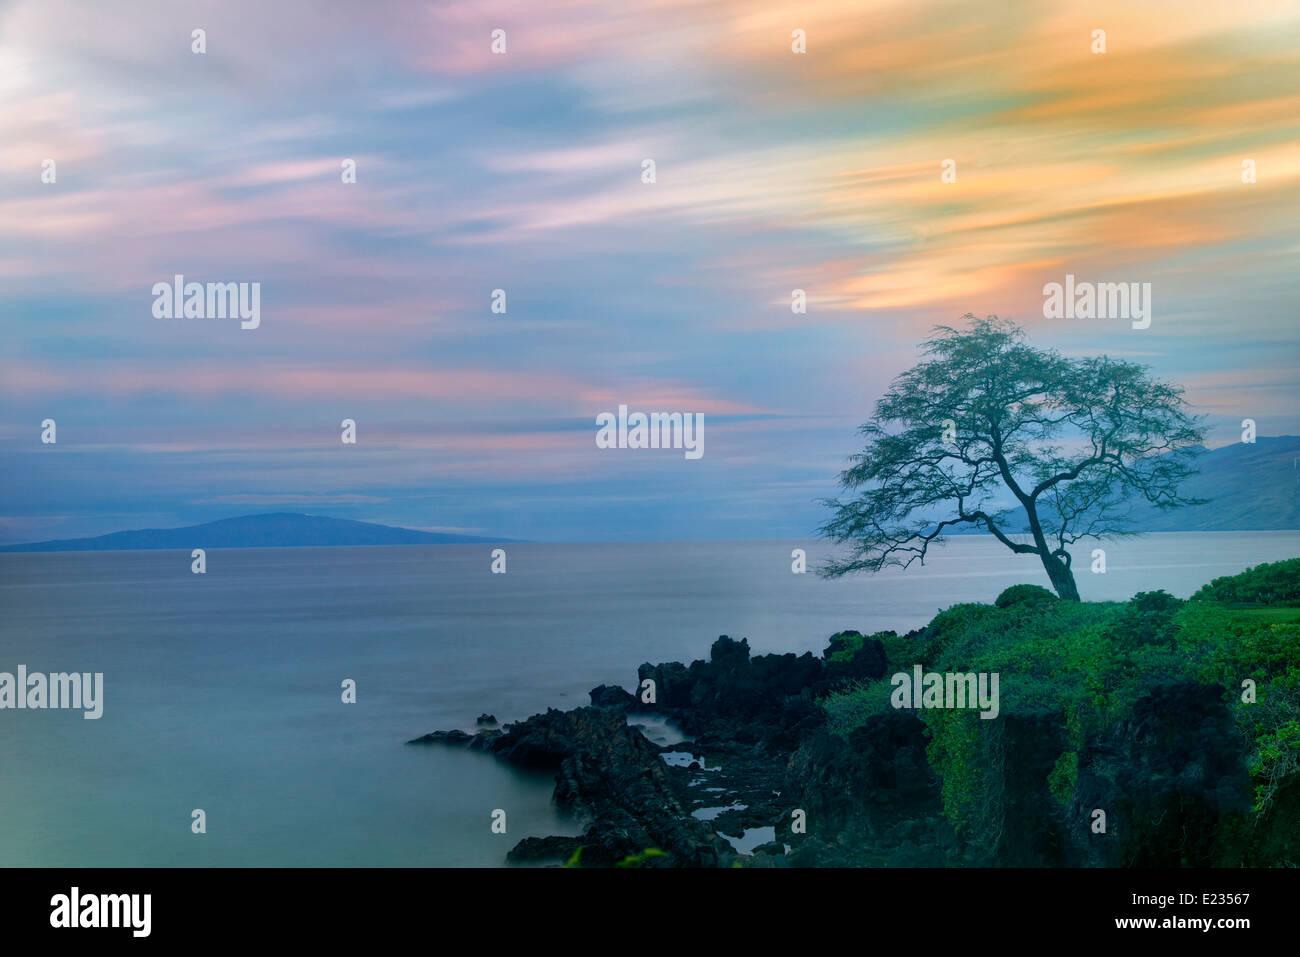 Lone tree and sunset. Maui, Hawaii - Stock Image